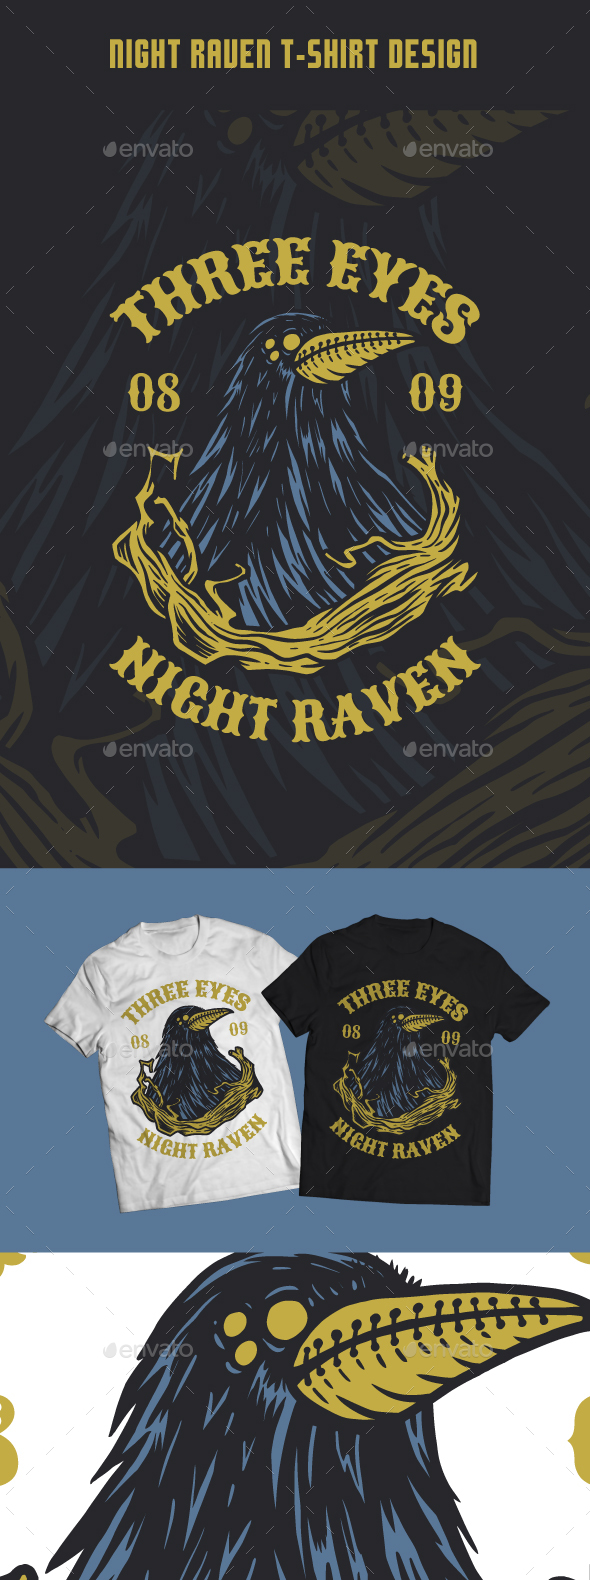 Night Raven T-Shirt Design